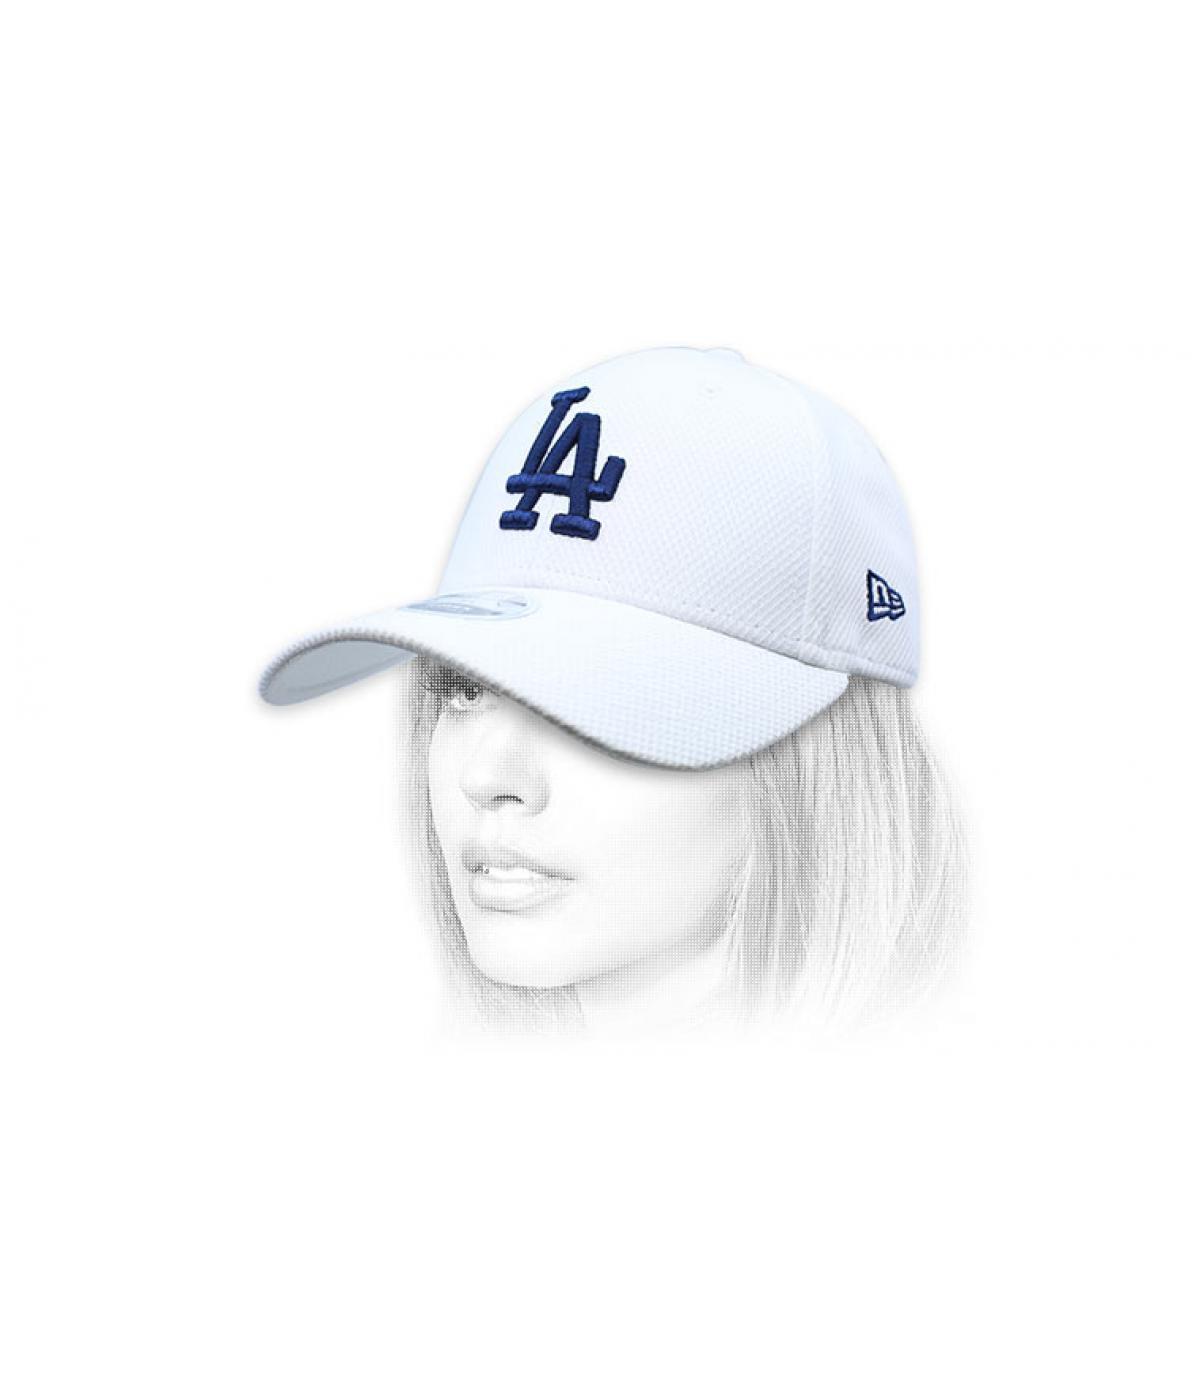 Damen Cap LA  weiß blau